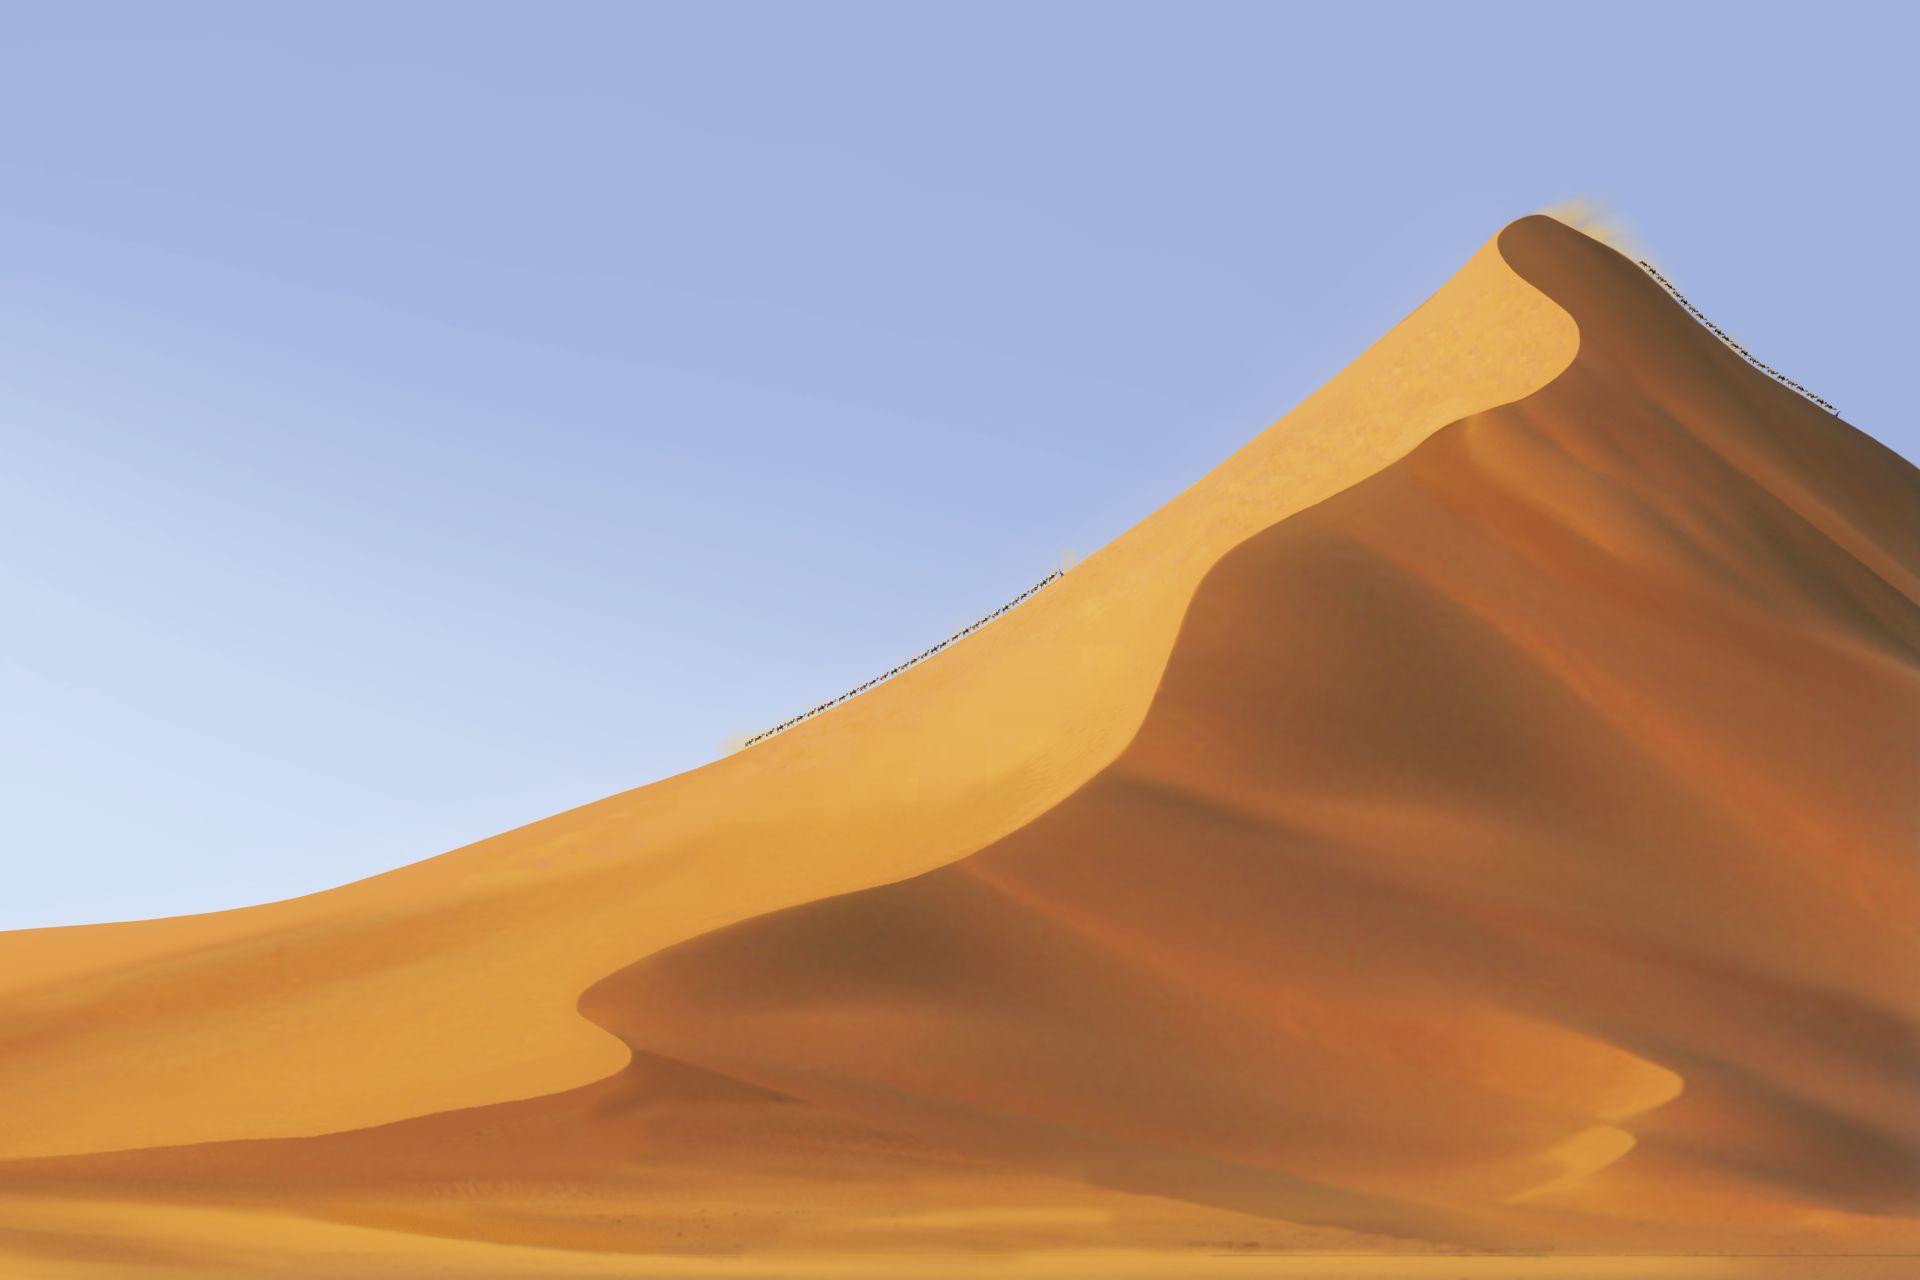 Desert clipart sand hill, Desert sand hill Transparent FREE.